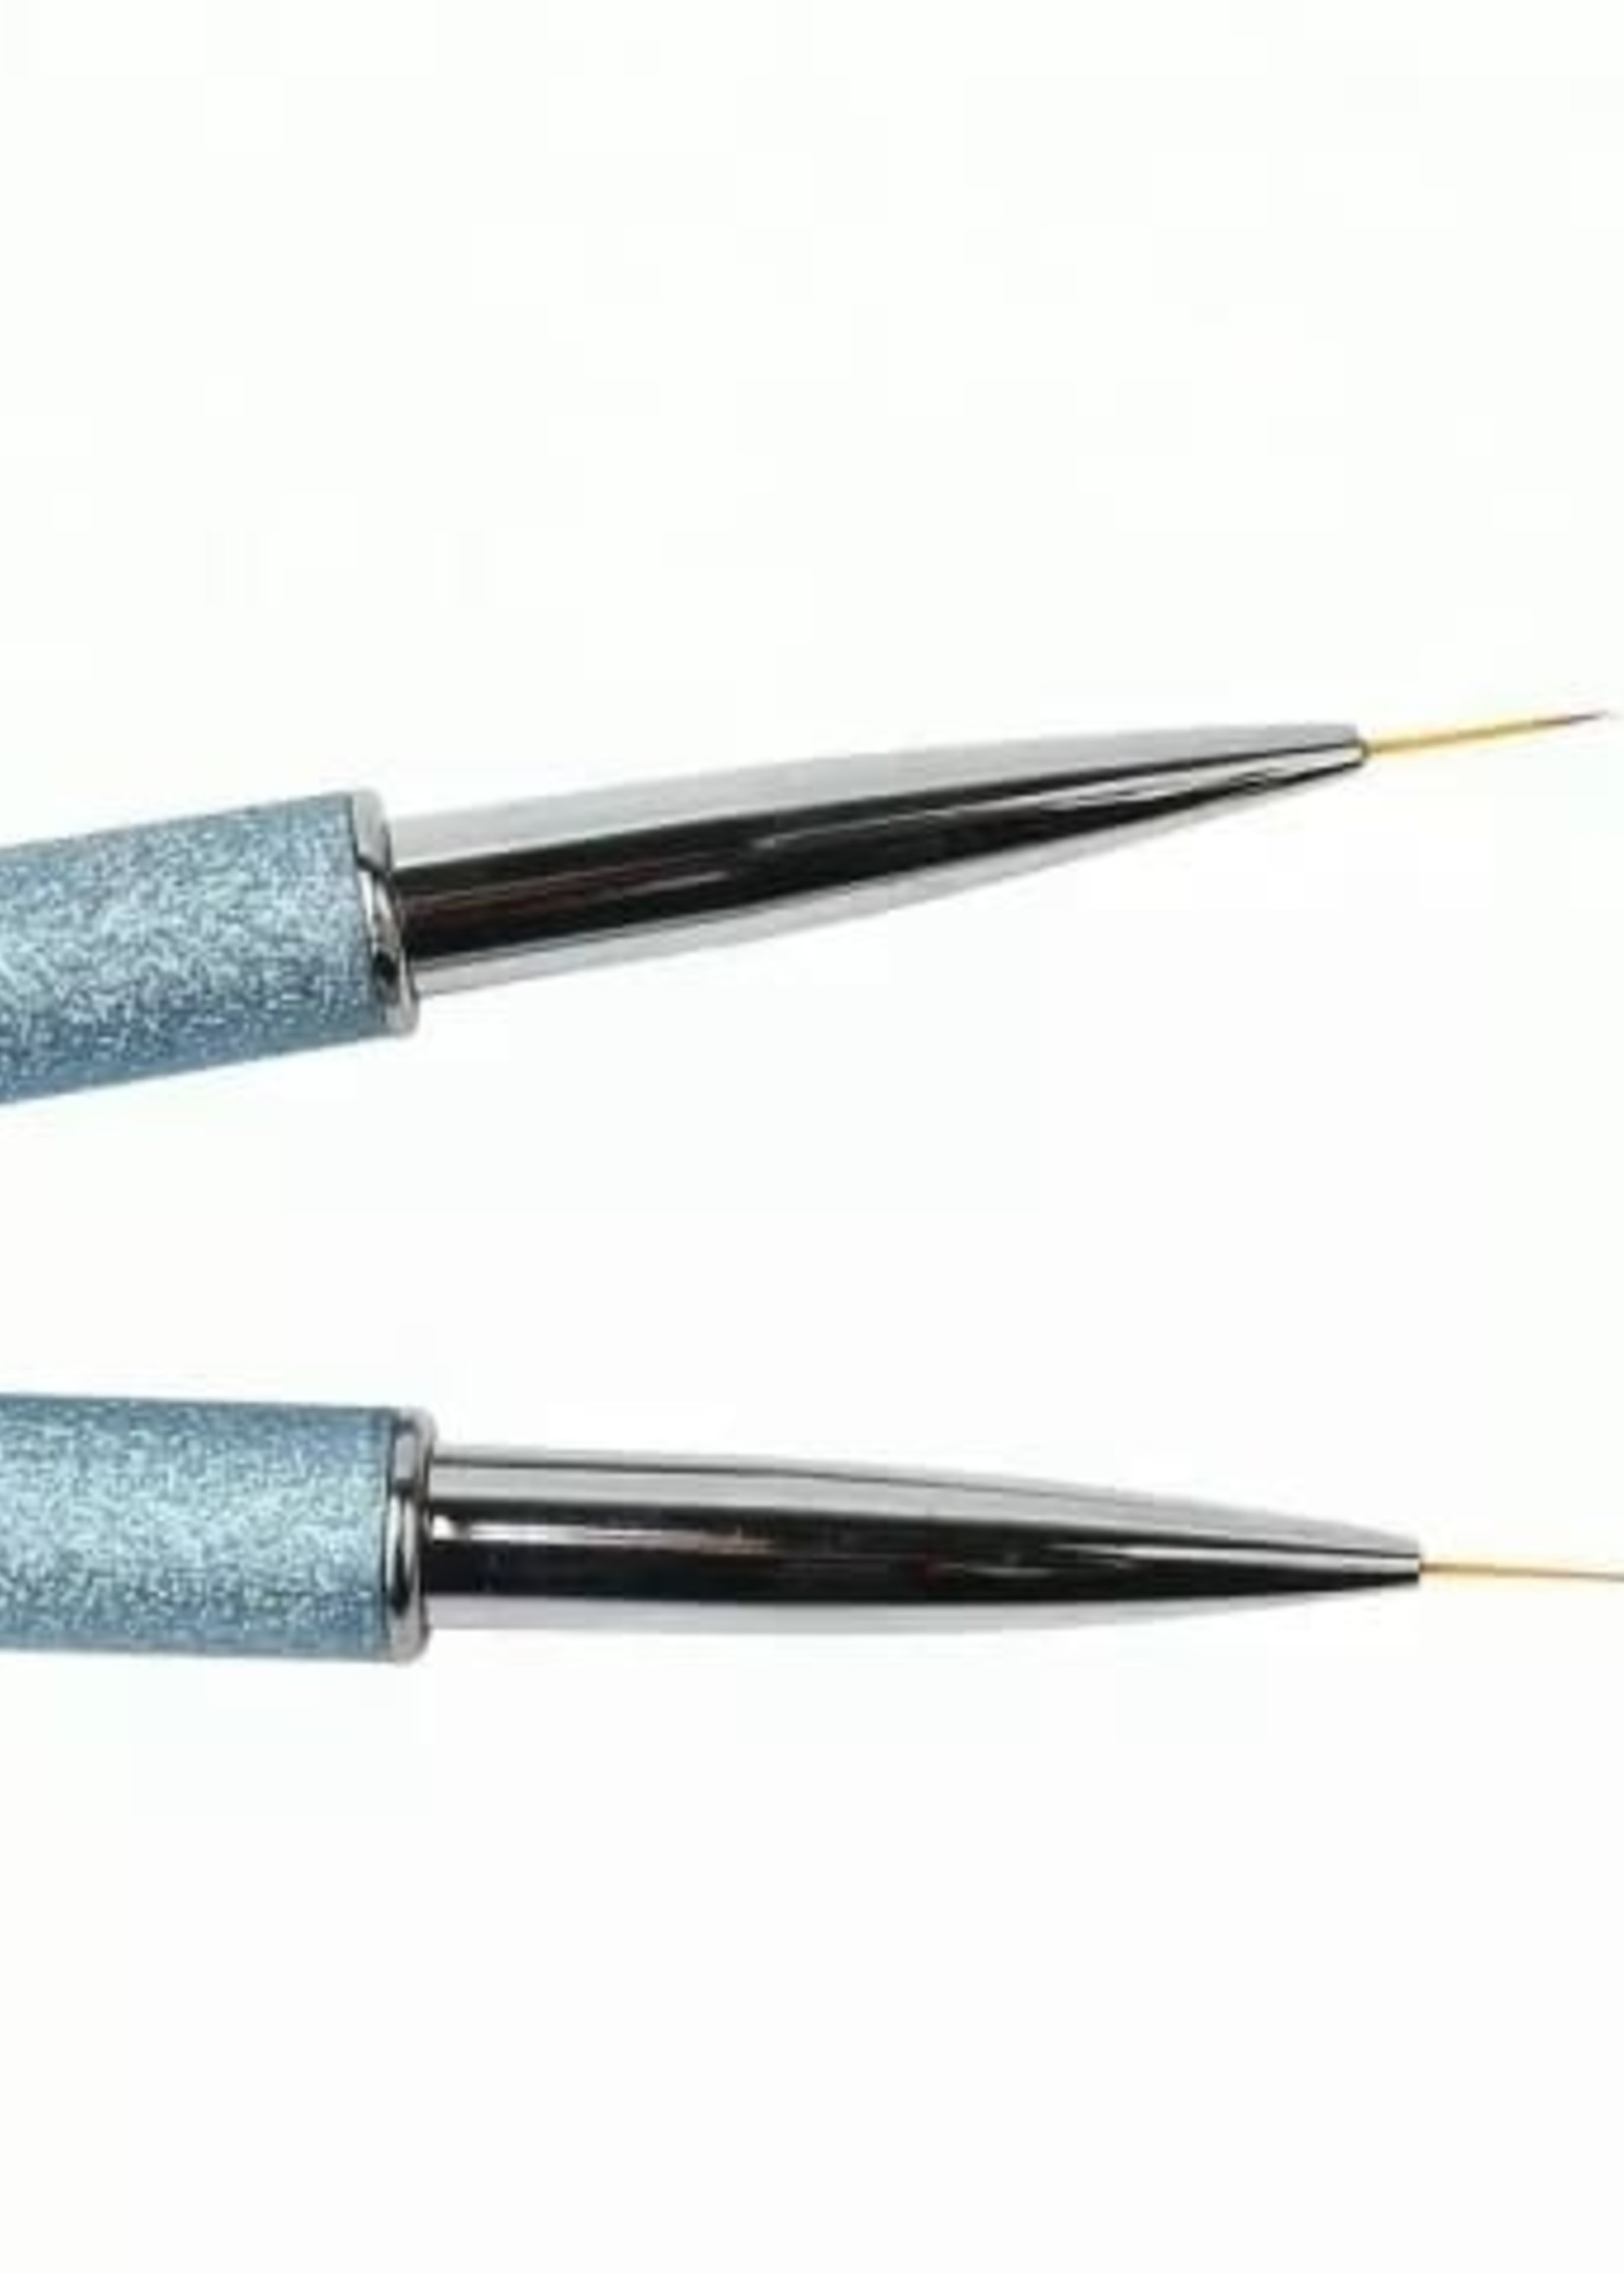 Nail art brush 7 mm